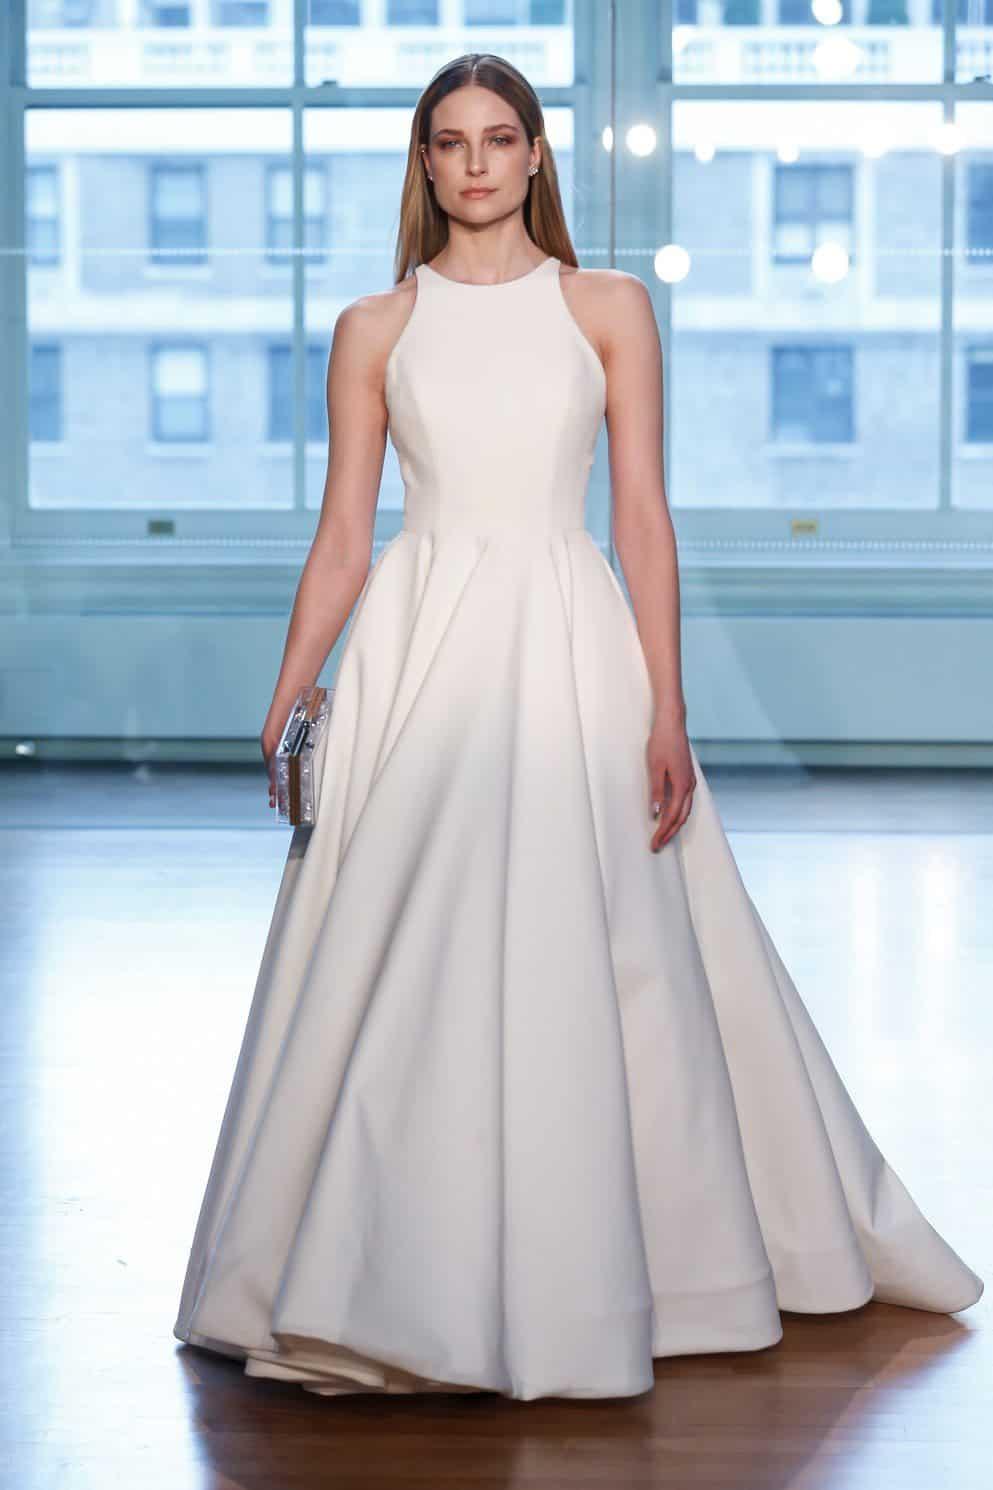 minimalismo-justin-alexander-wedding-dresses-spring-2019-008-1